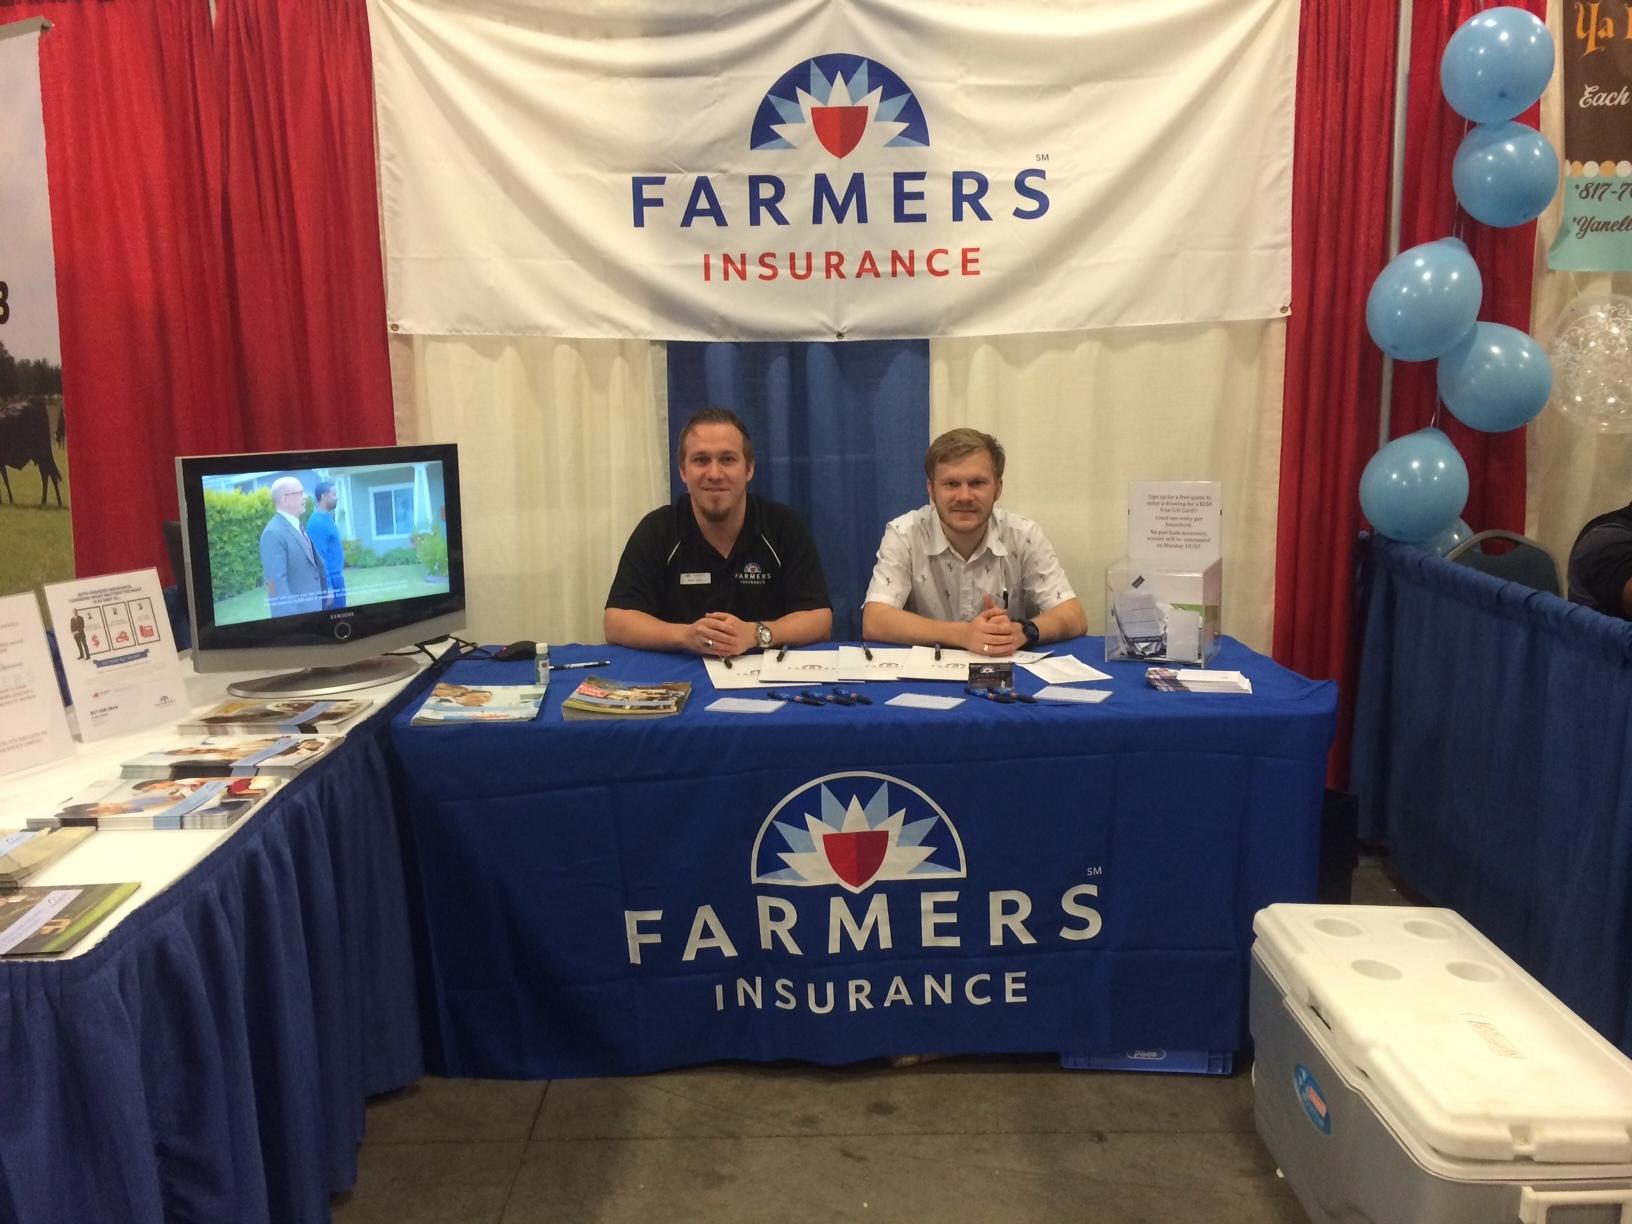 Farmers Insurance - Blake Jones image 4